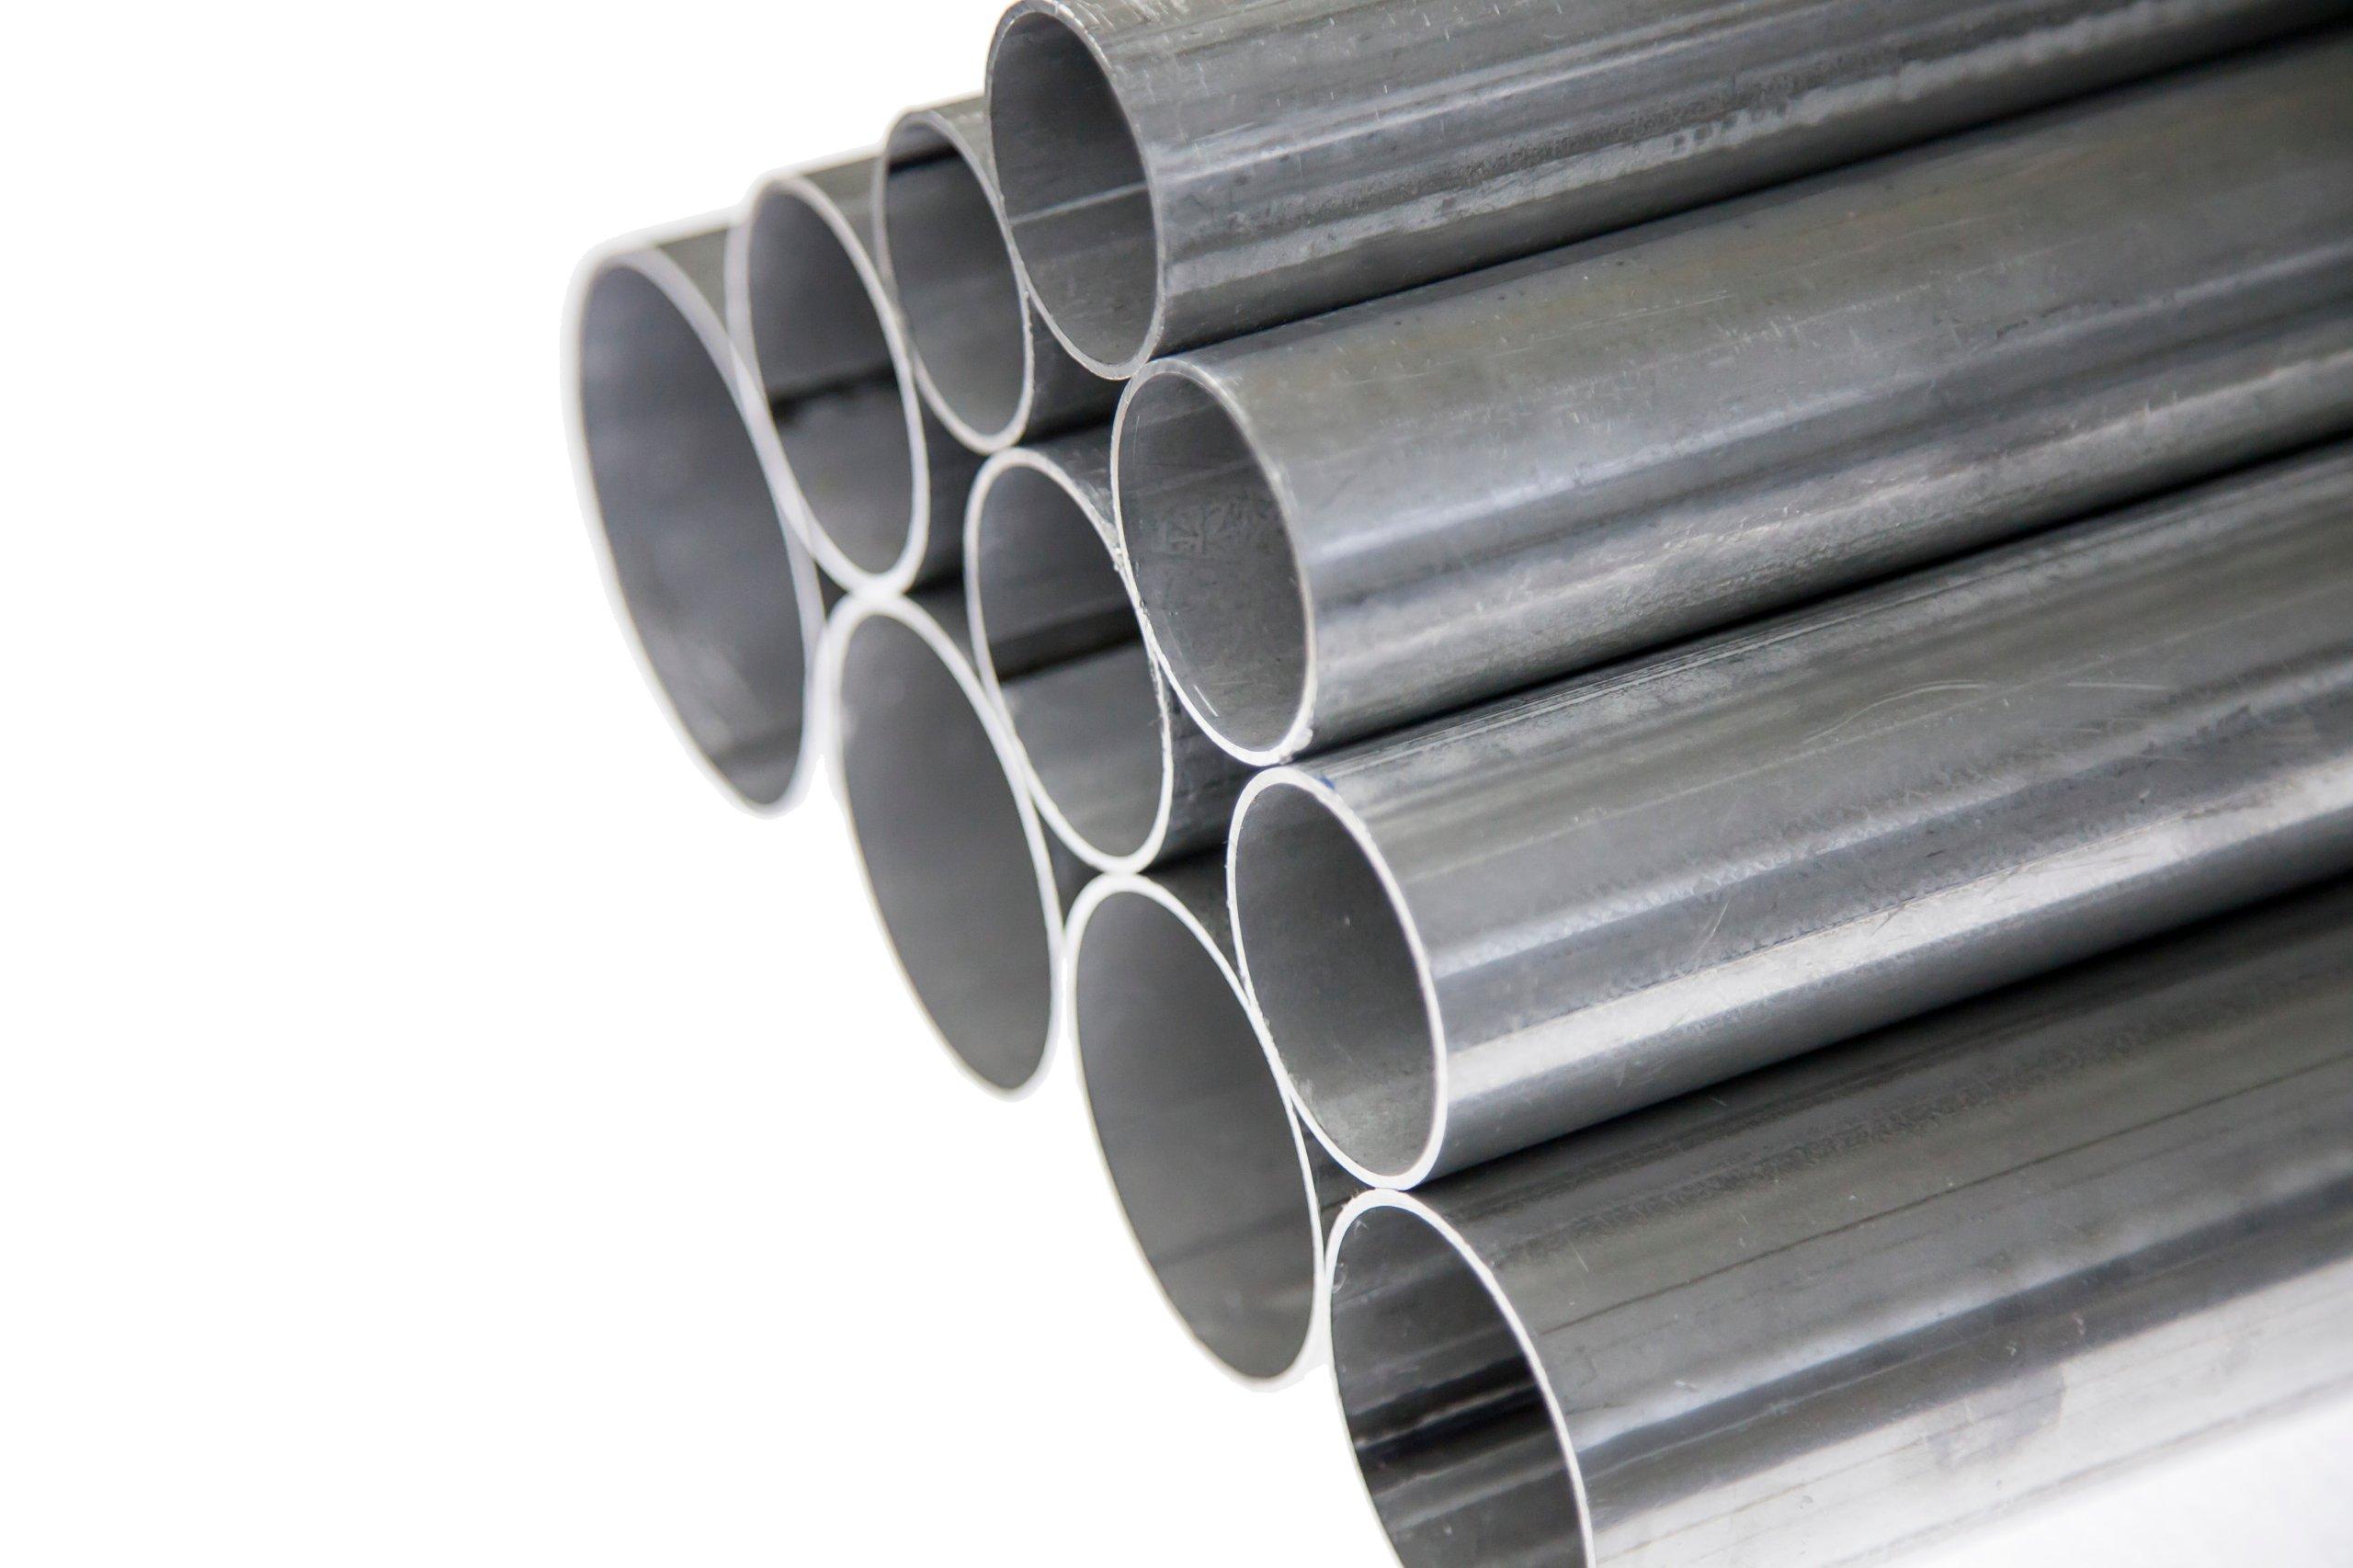 Алюминиевая прямошовная труба диаметром 65 мм